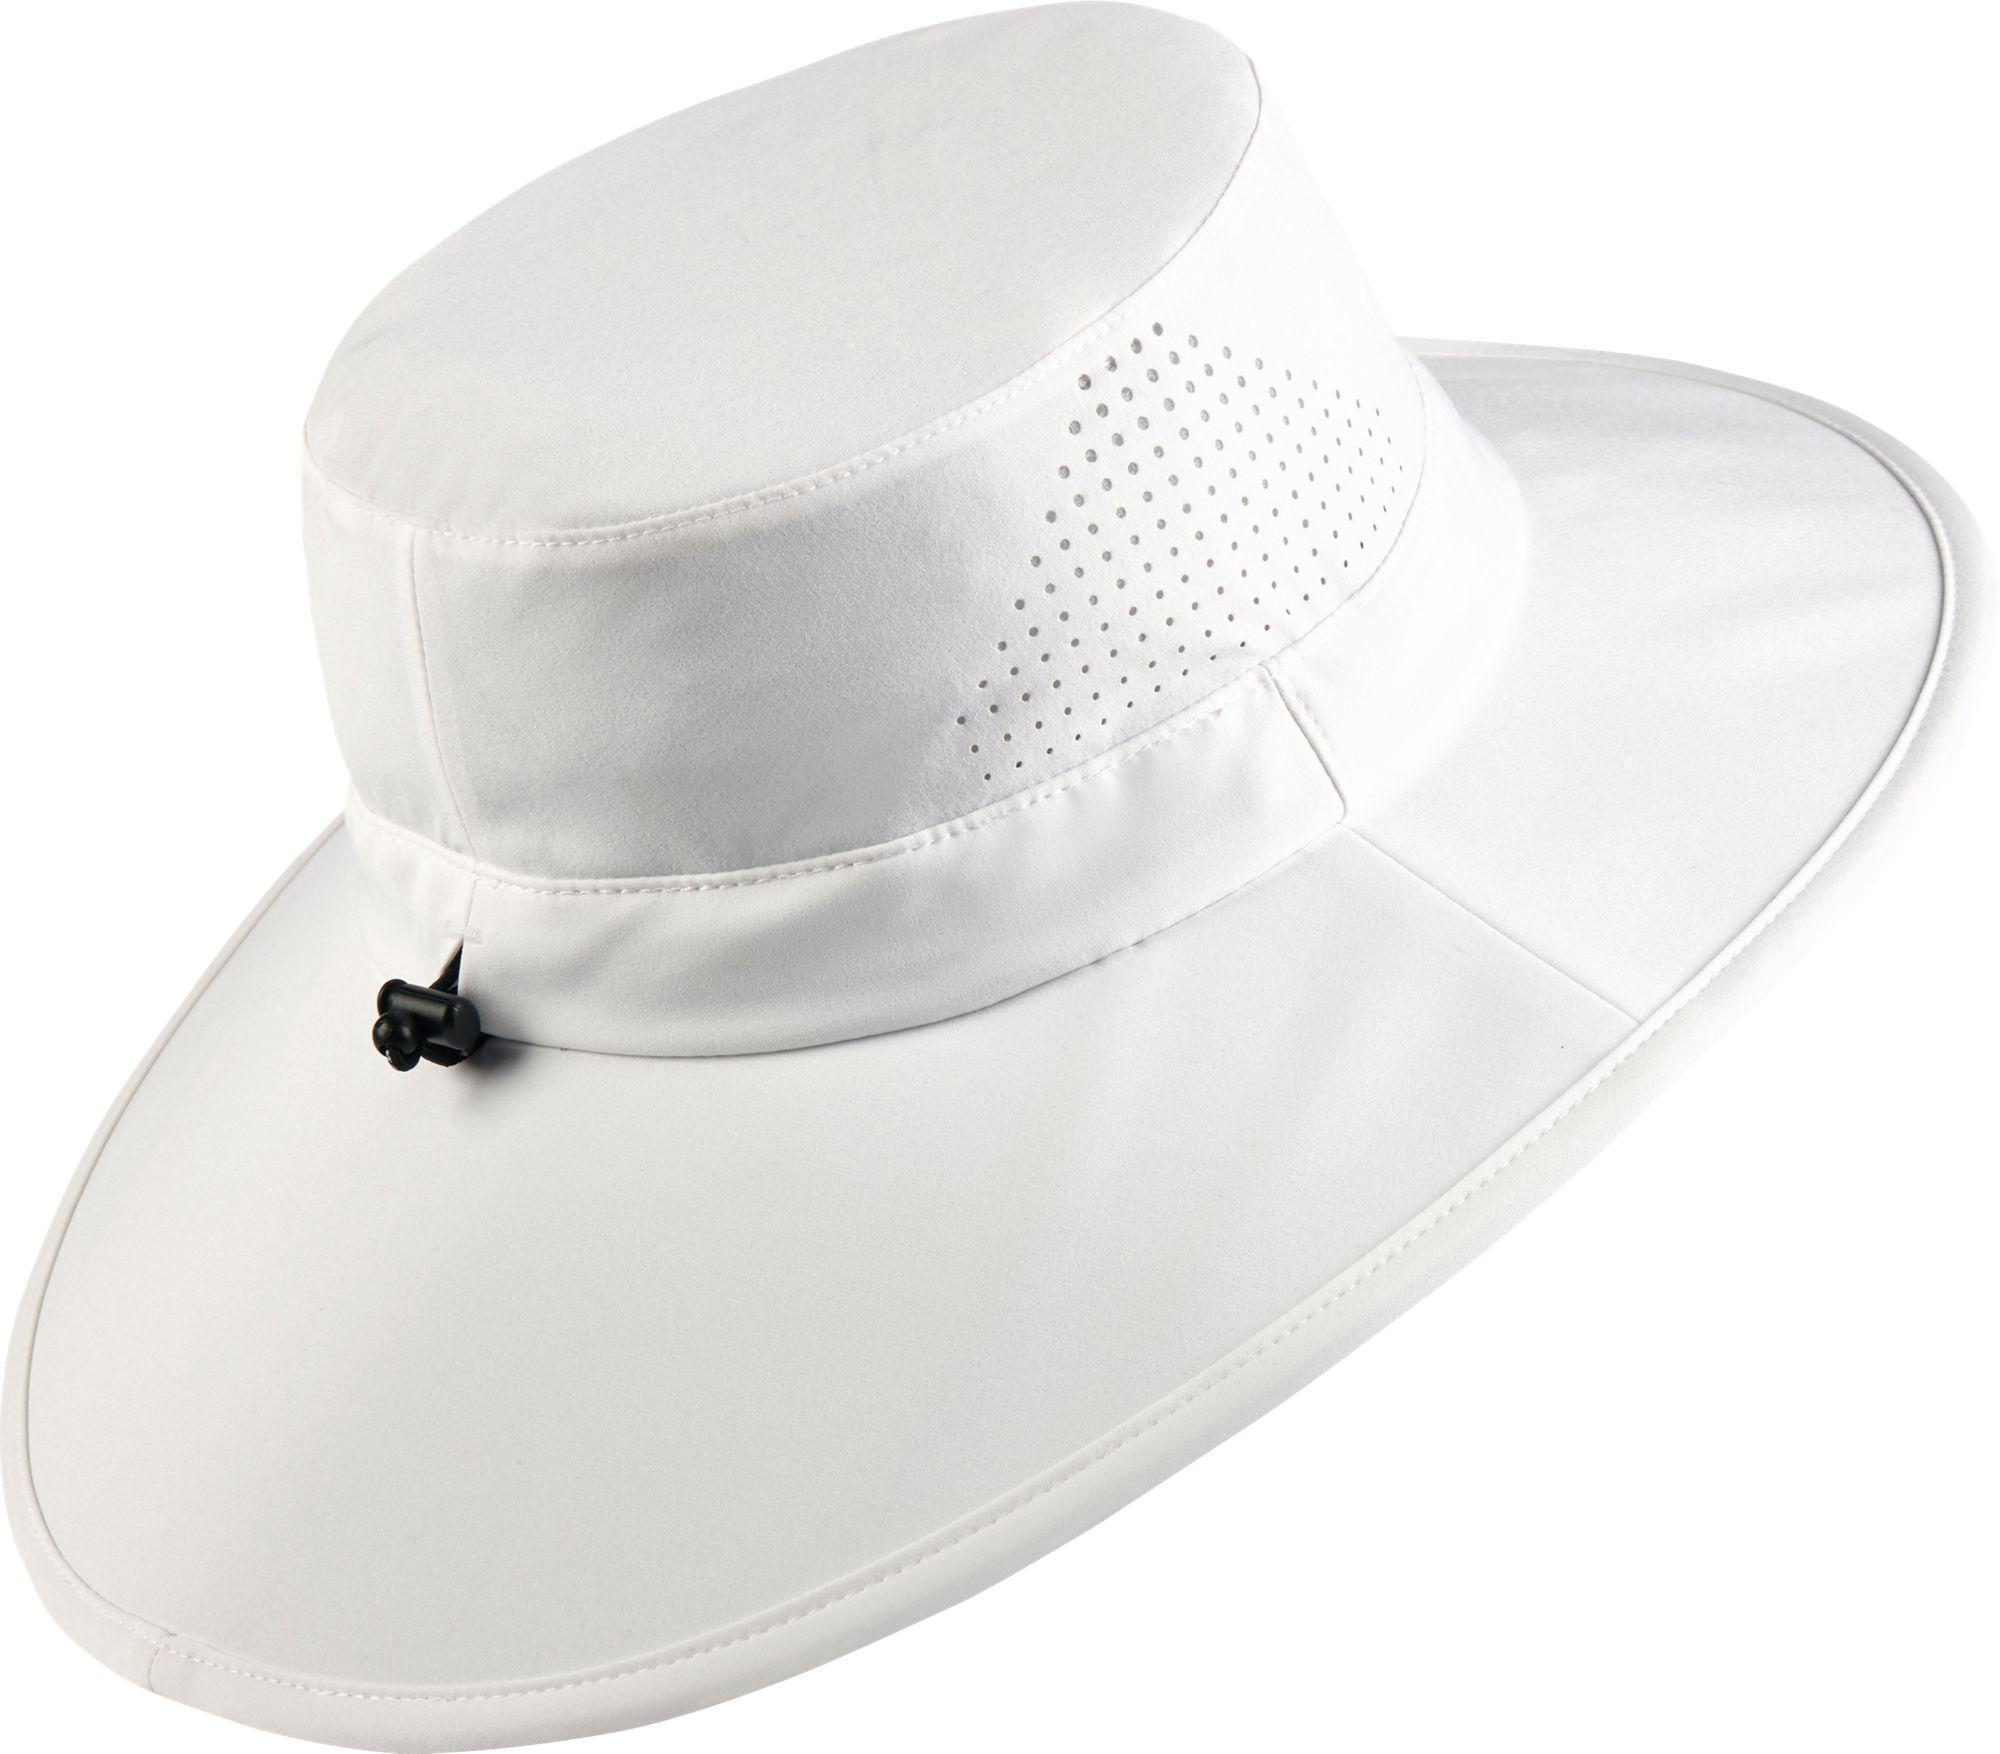 533c939bdb7 Nike - White Sun Protect 2.0 Golf Hat for Men - Lyst. View fullscreen